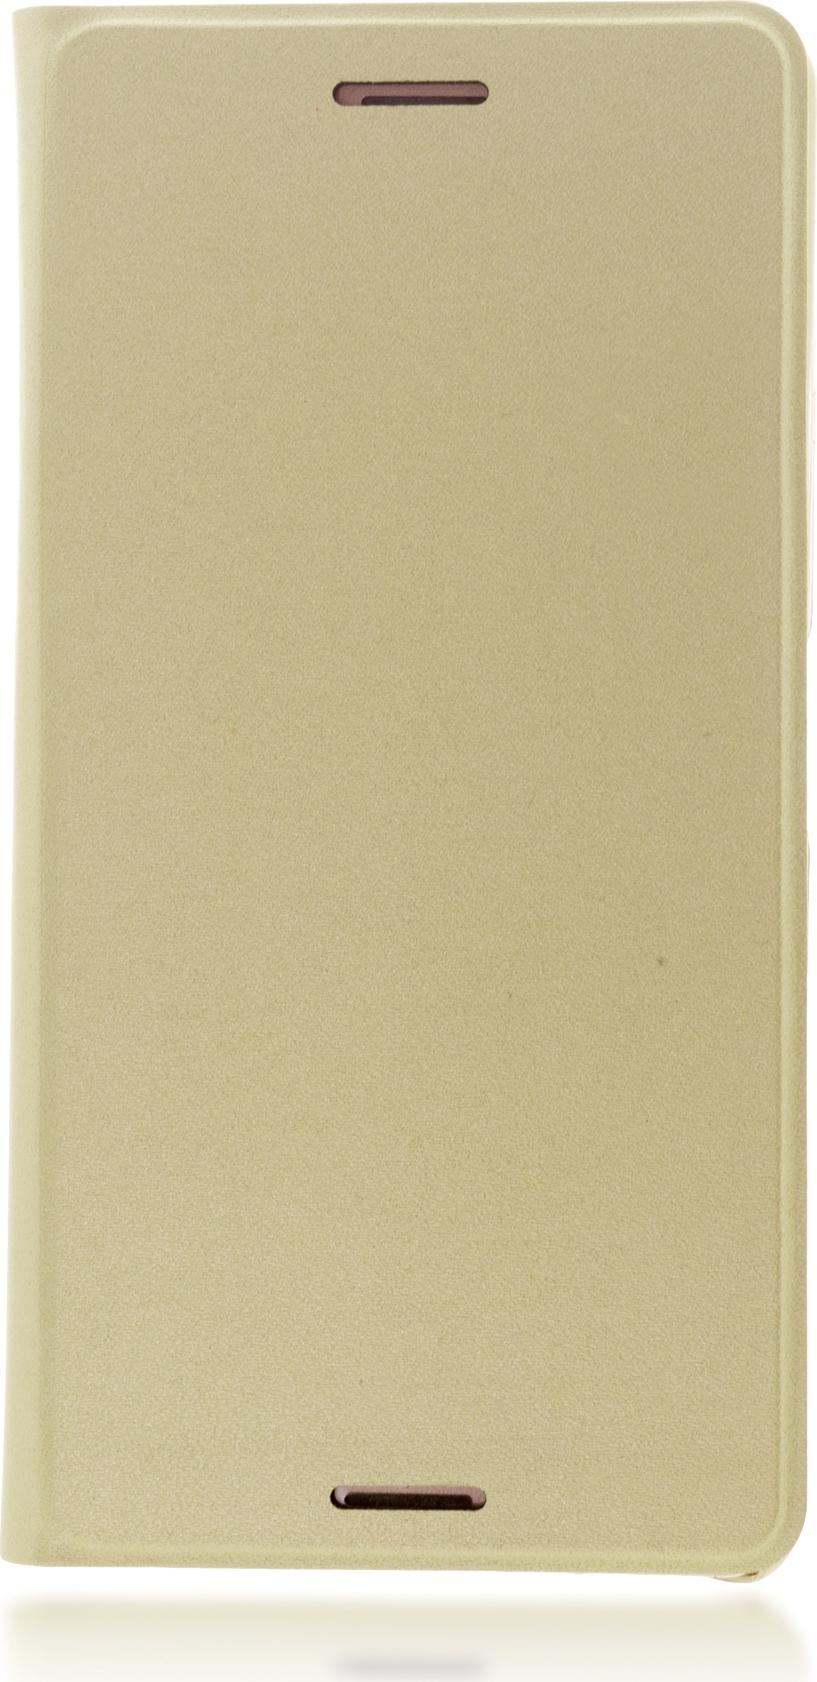 Чехол Brosco Book для Sony Xperia X, золотой цена и фото